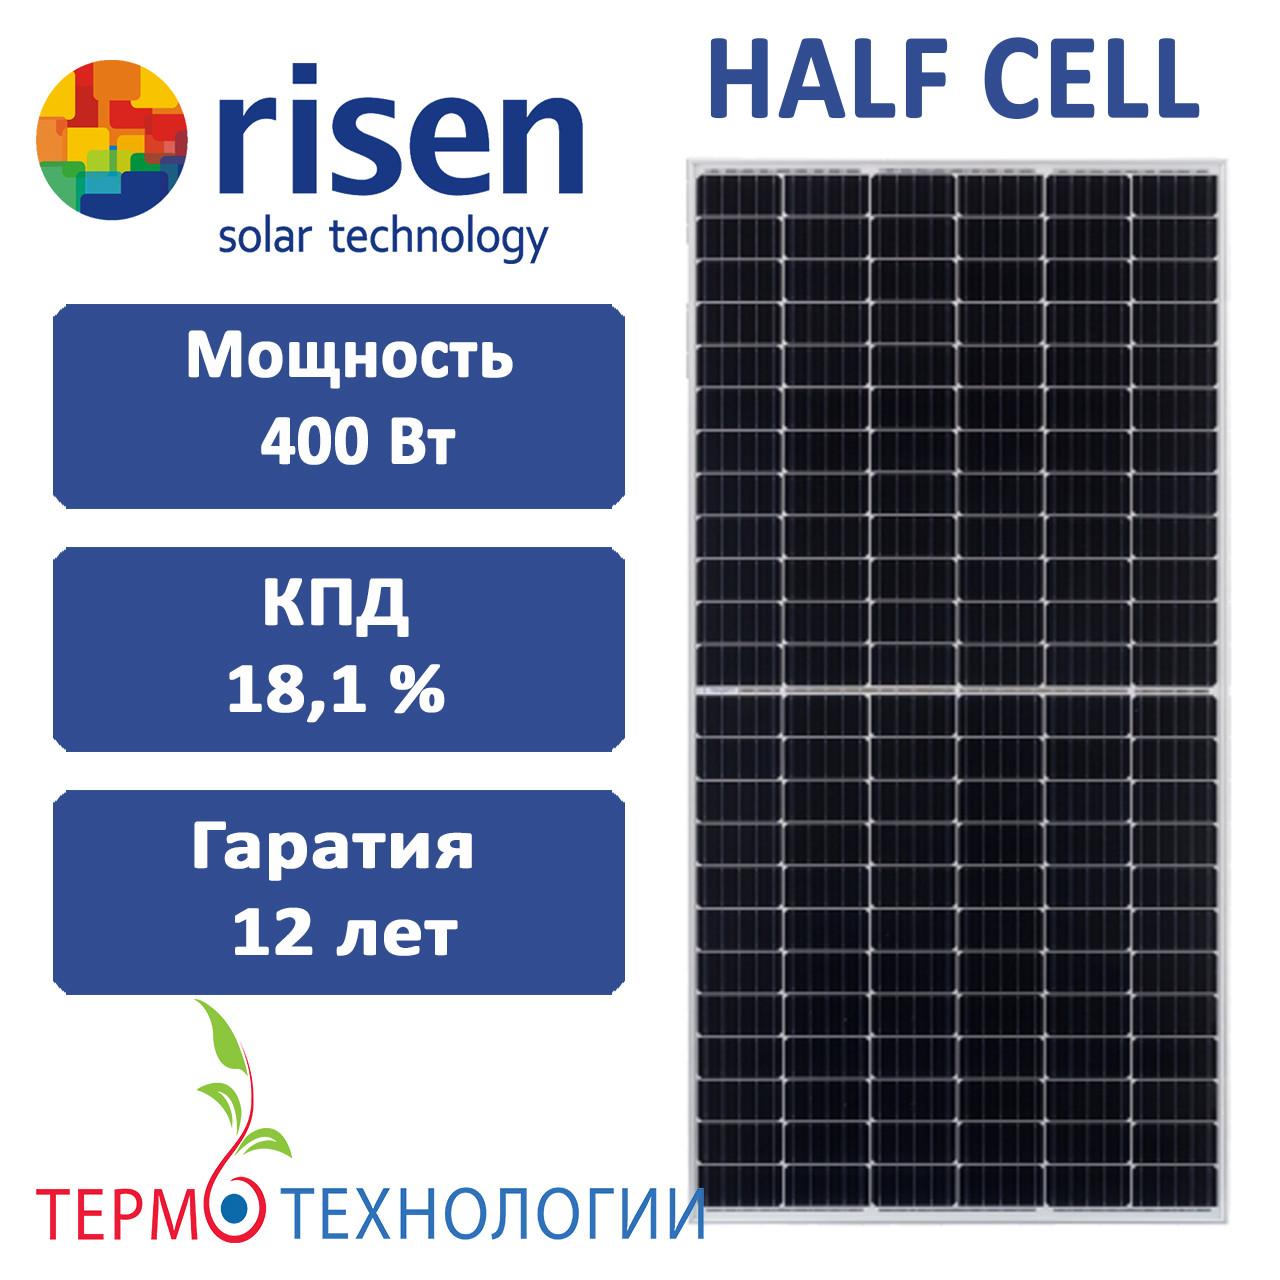 Солнечная батарея Risen 400 Вт Half Cell, Mono